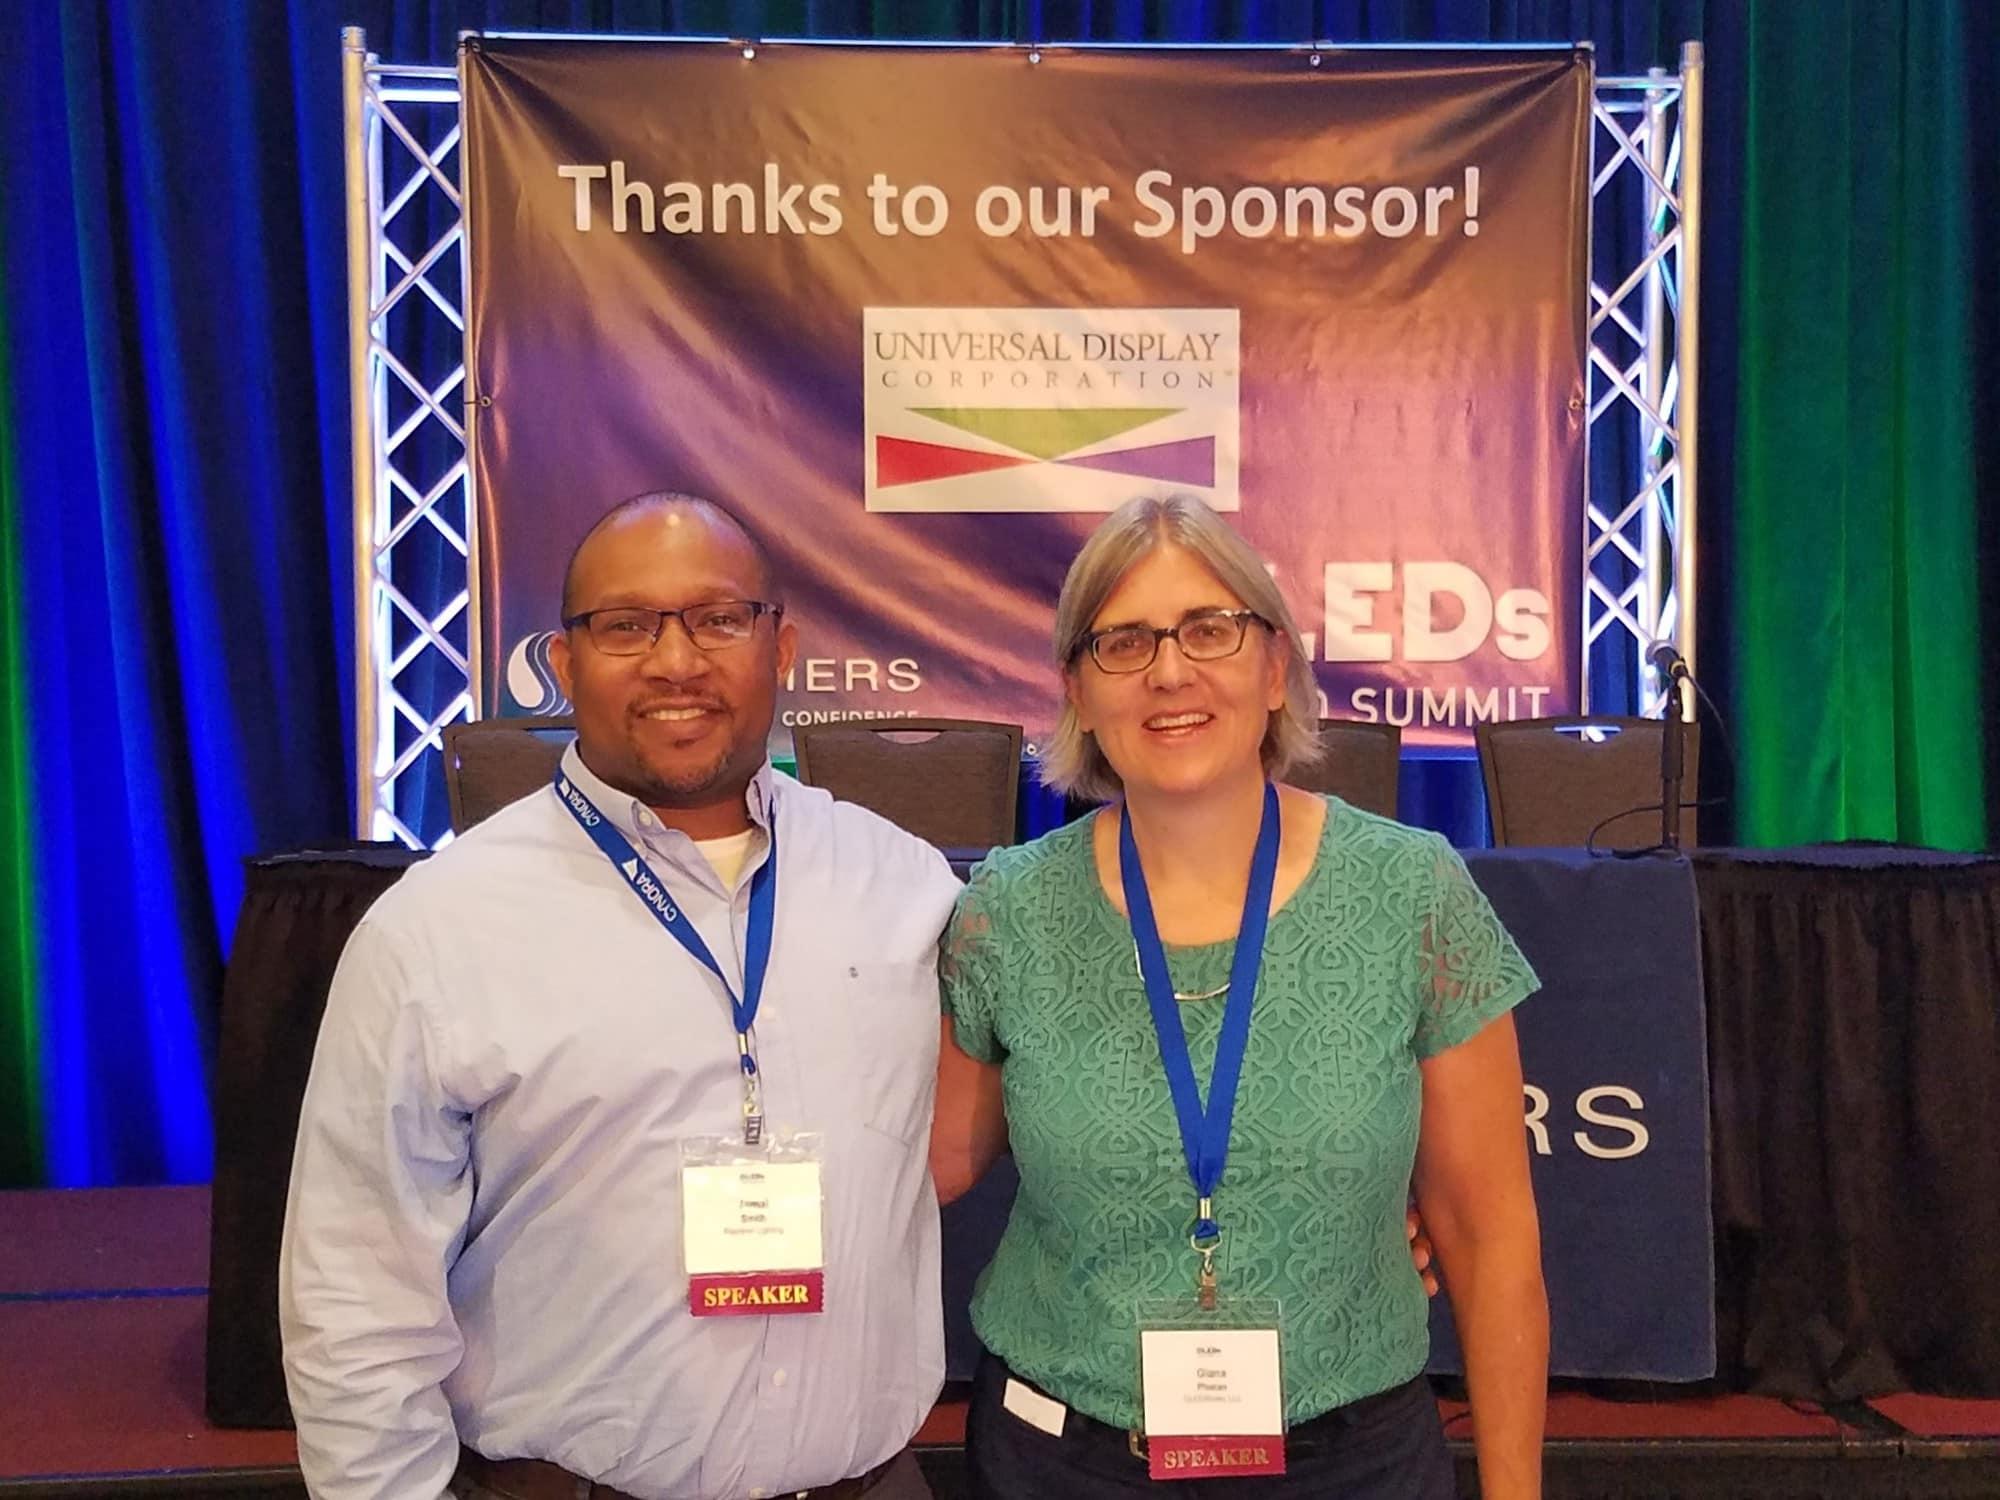 Acuity's Jamal and OLEDWorks' Giana at OLEDs World Summit | OLEDWorks